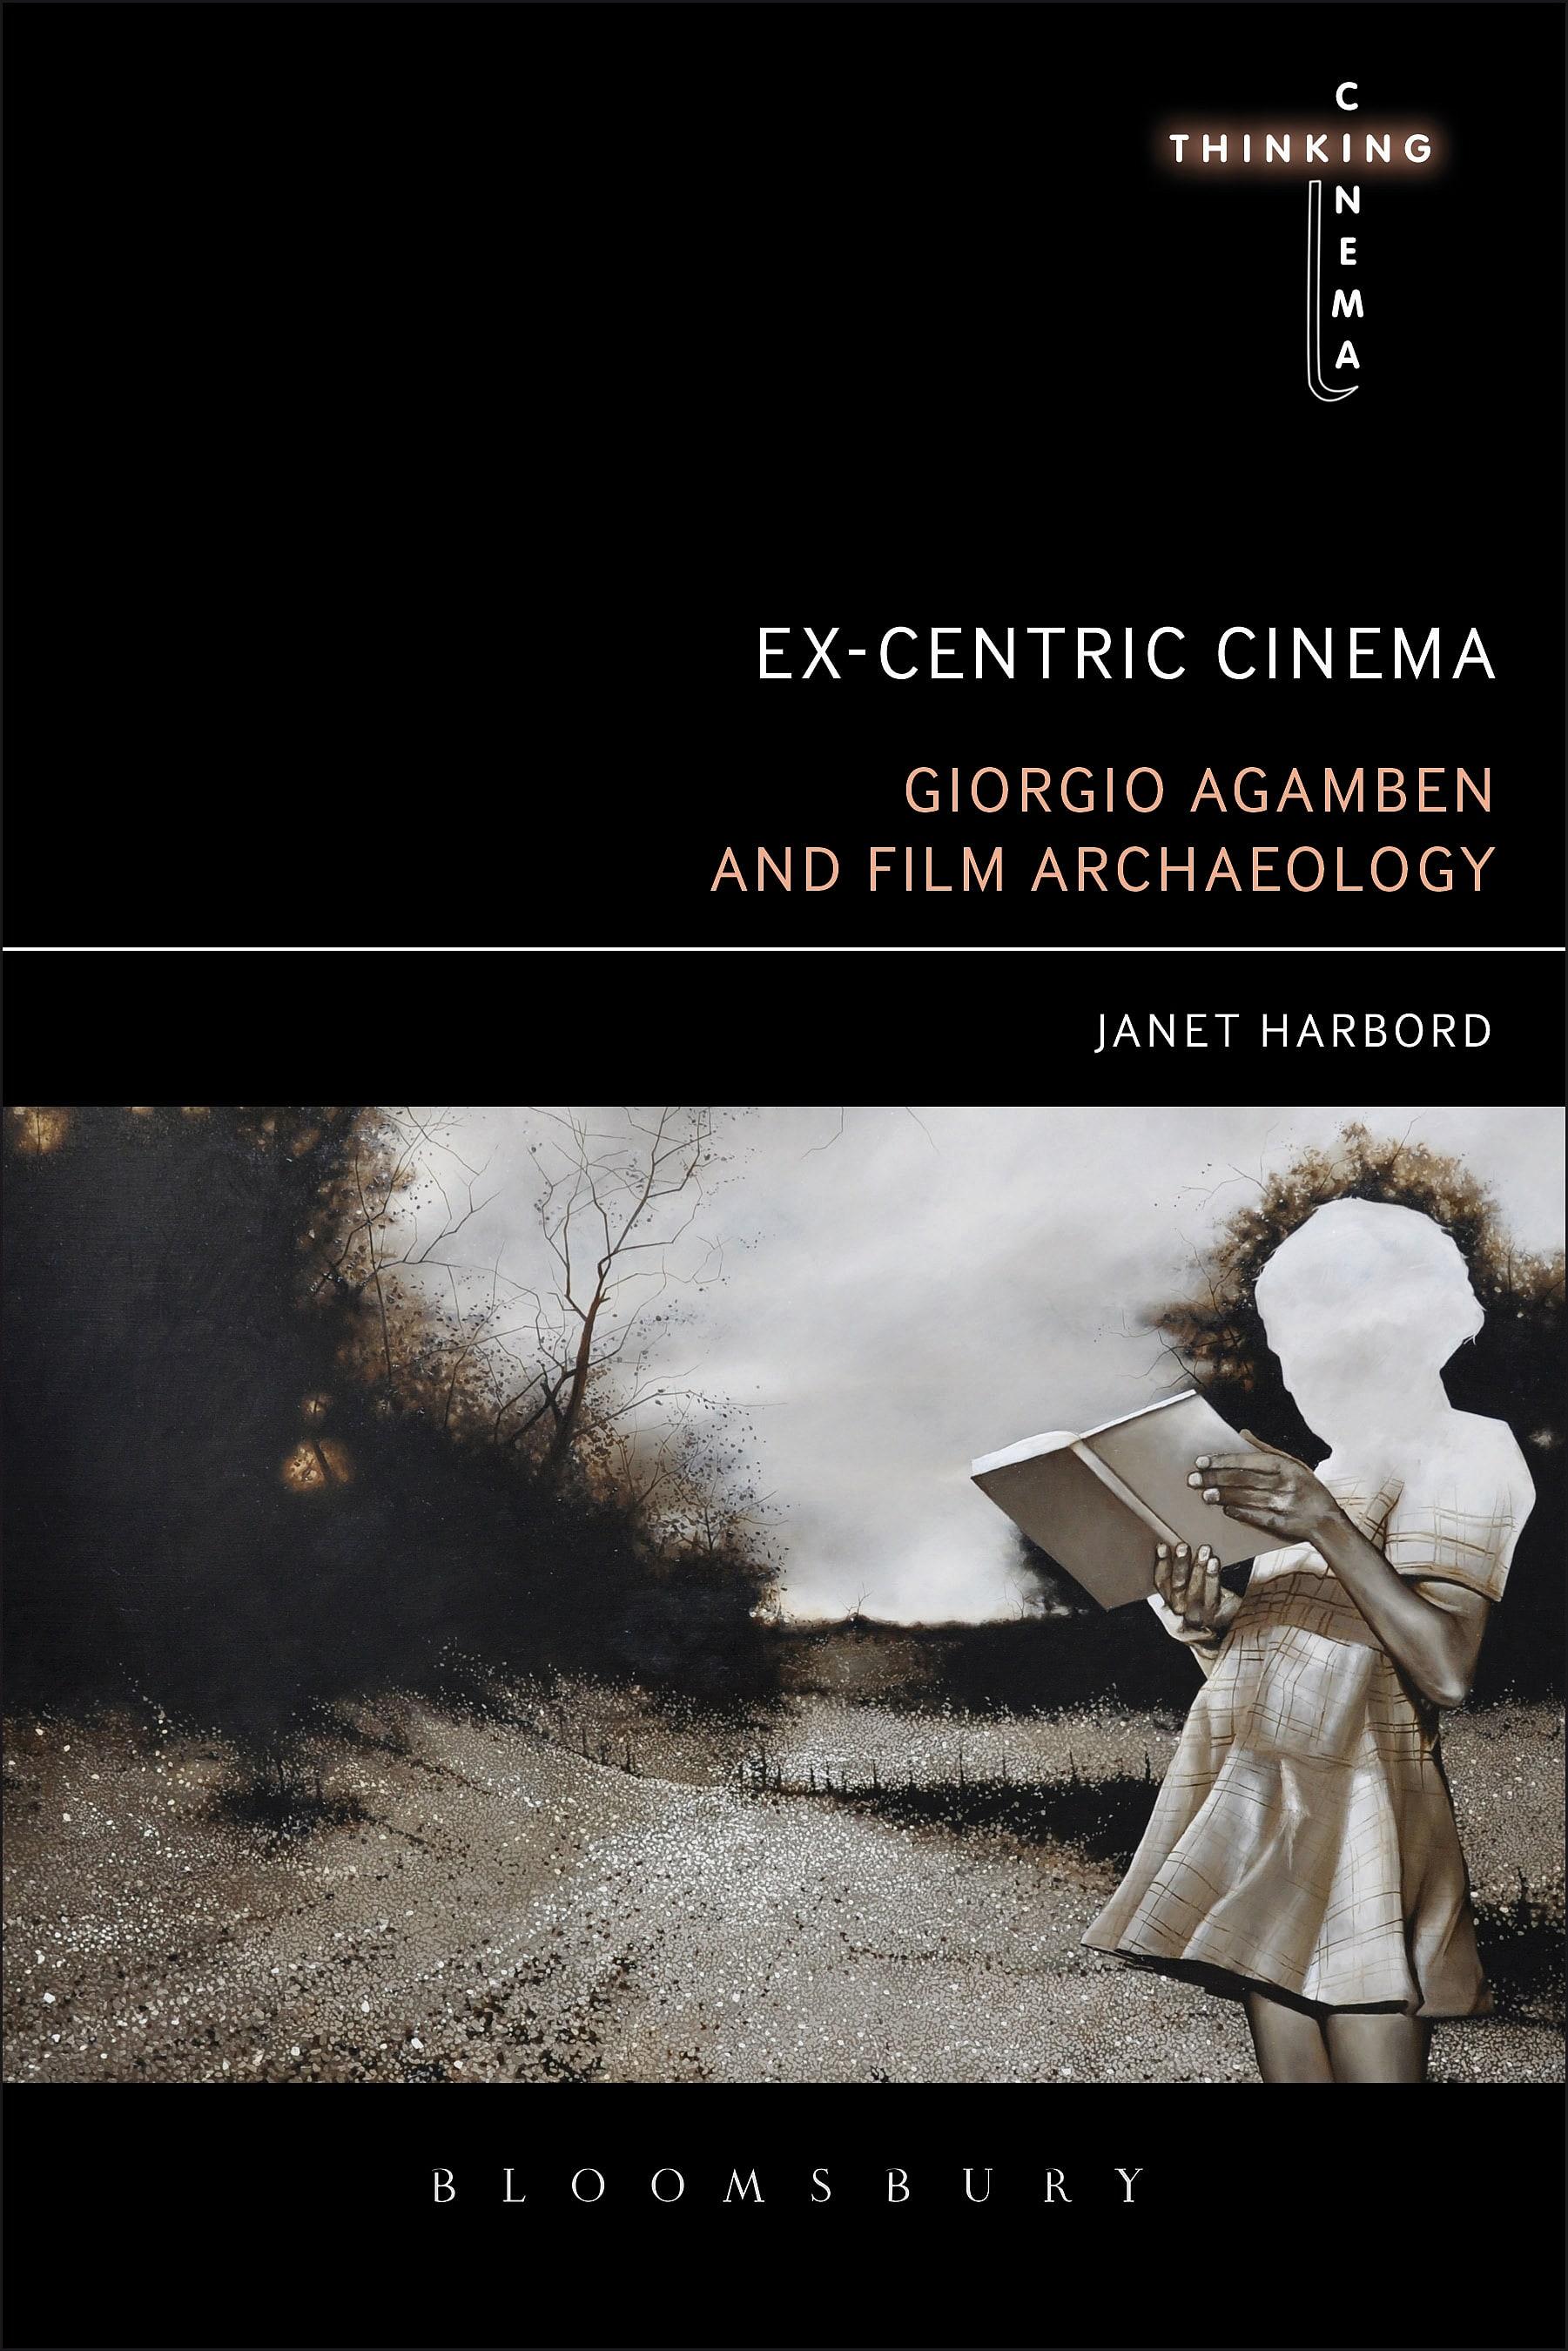 Ex-centric Cinema